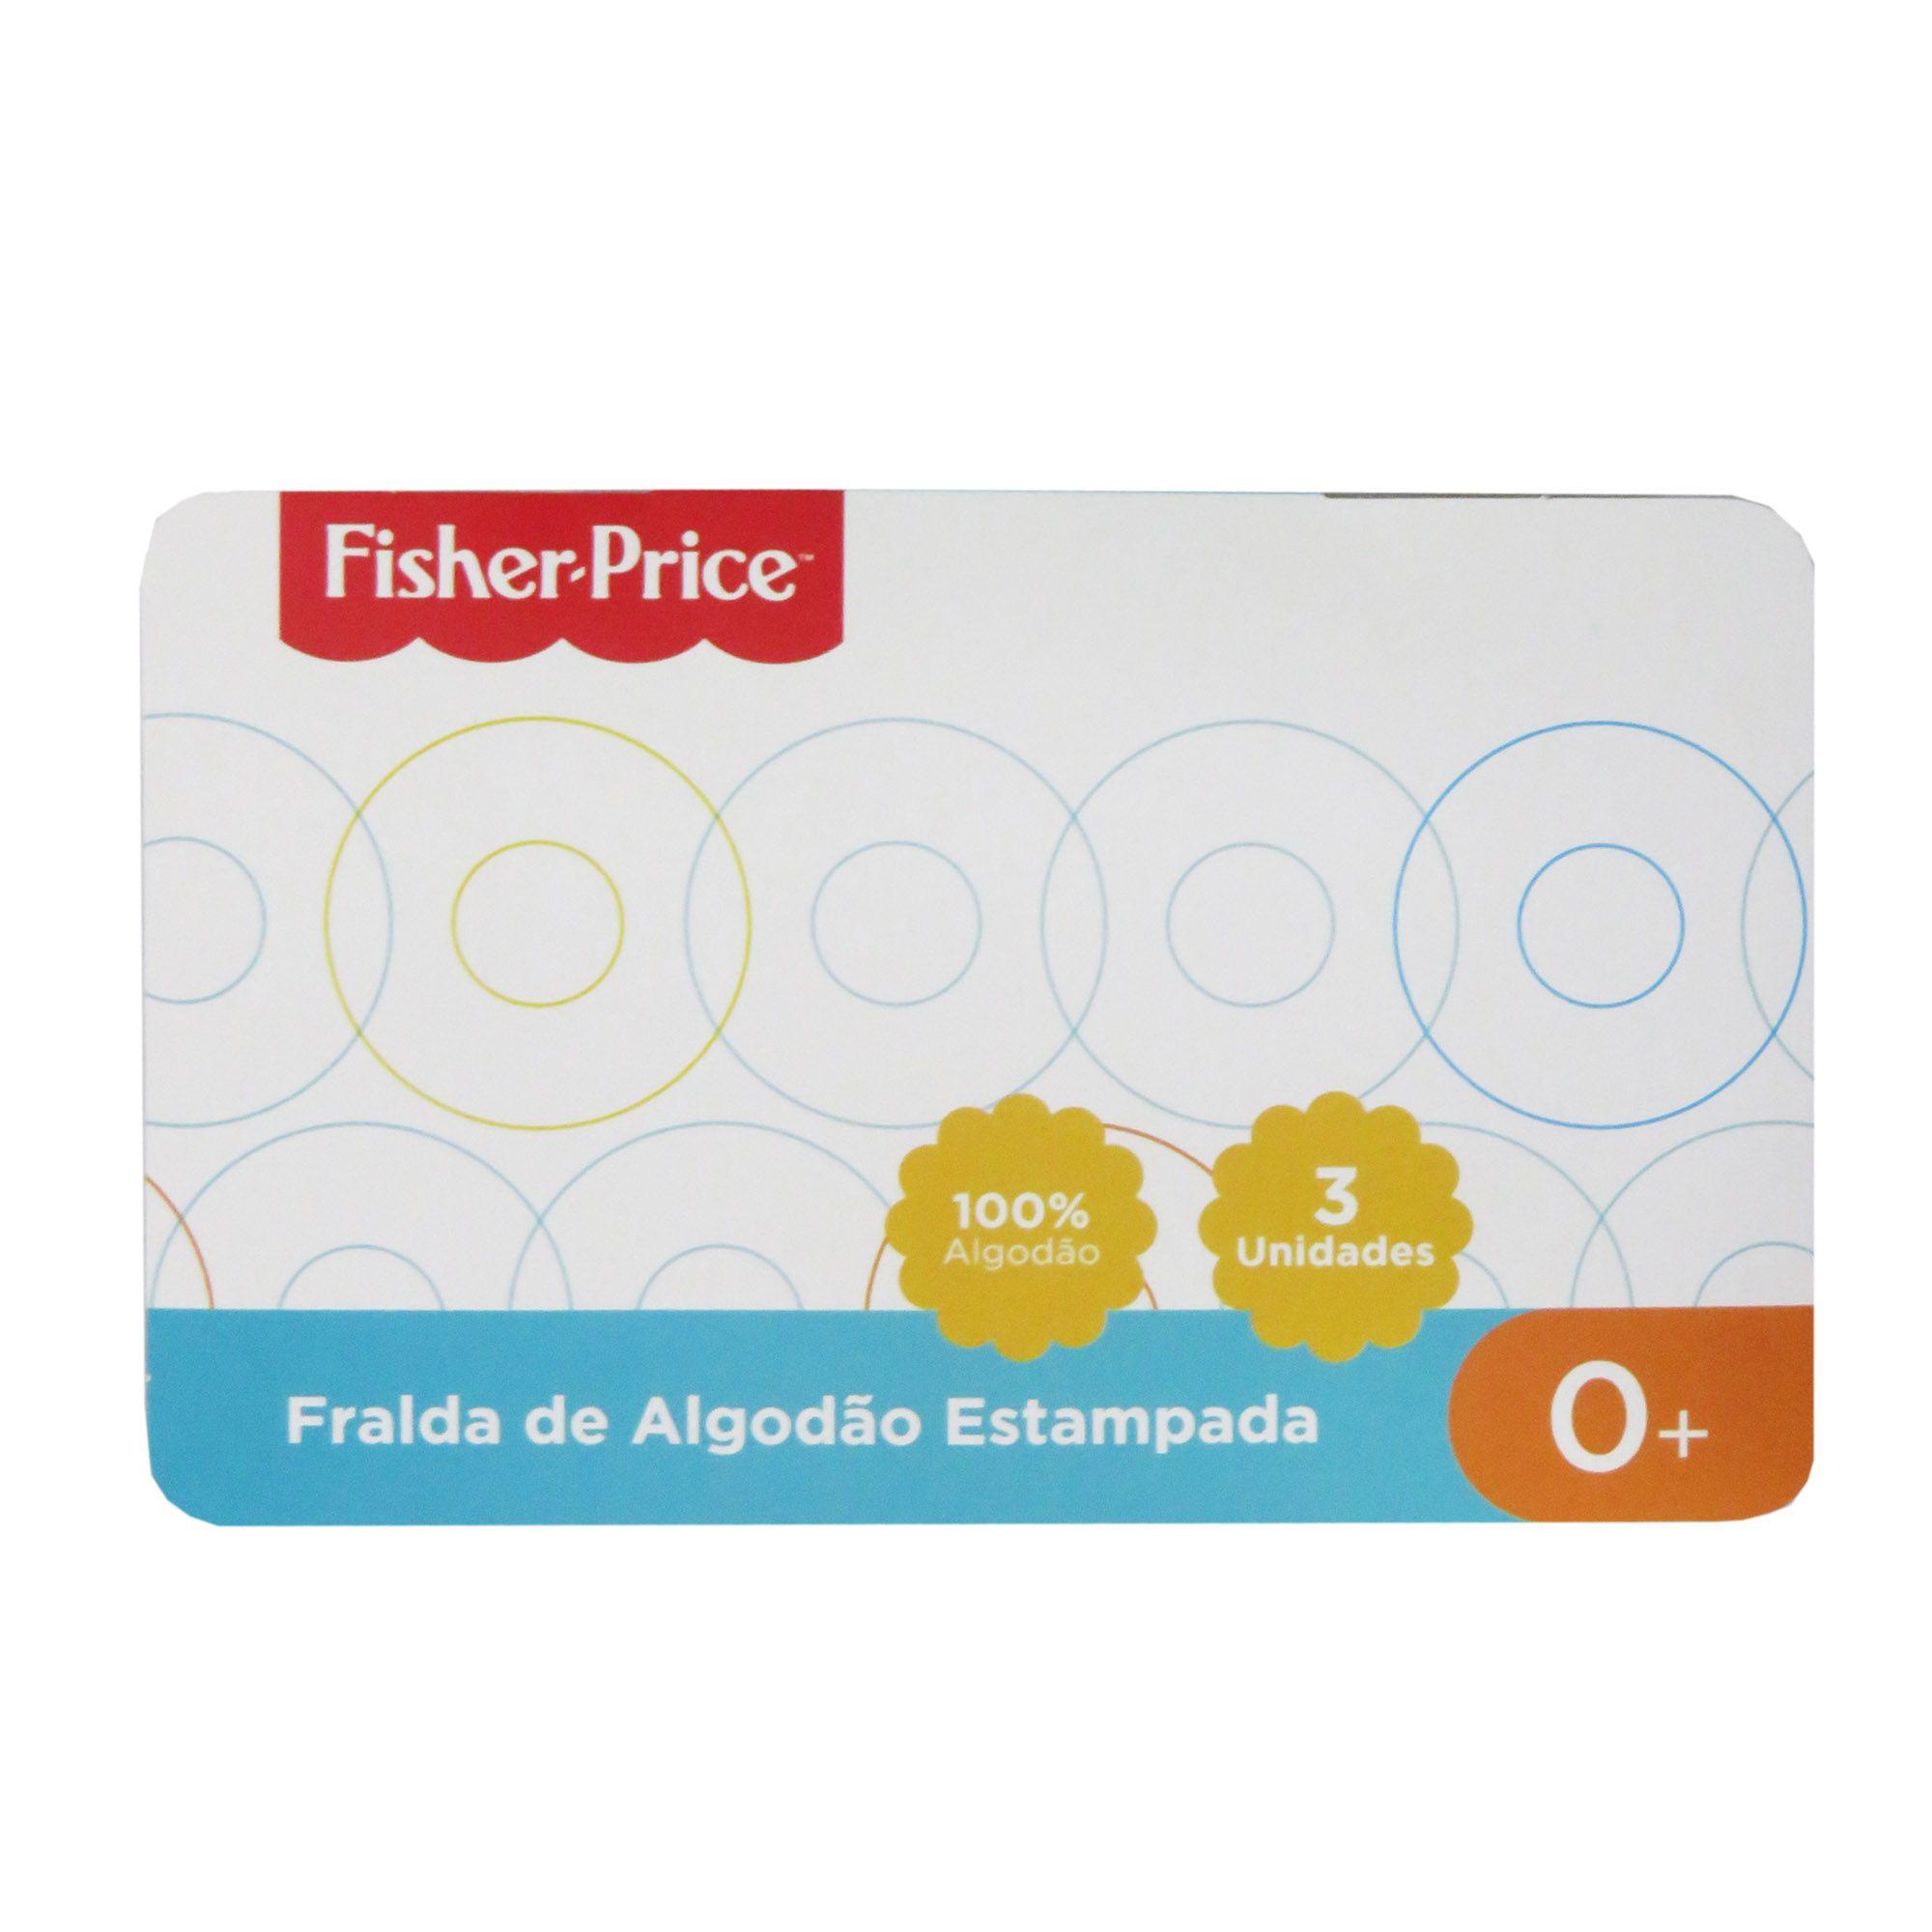 Fralda Incomfral Fisher-Price - Estampada